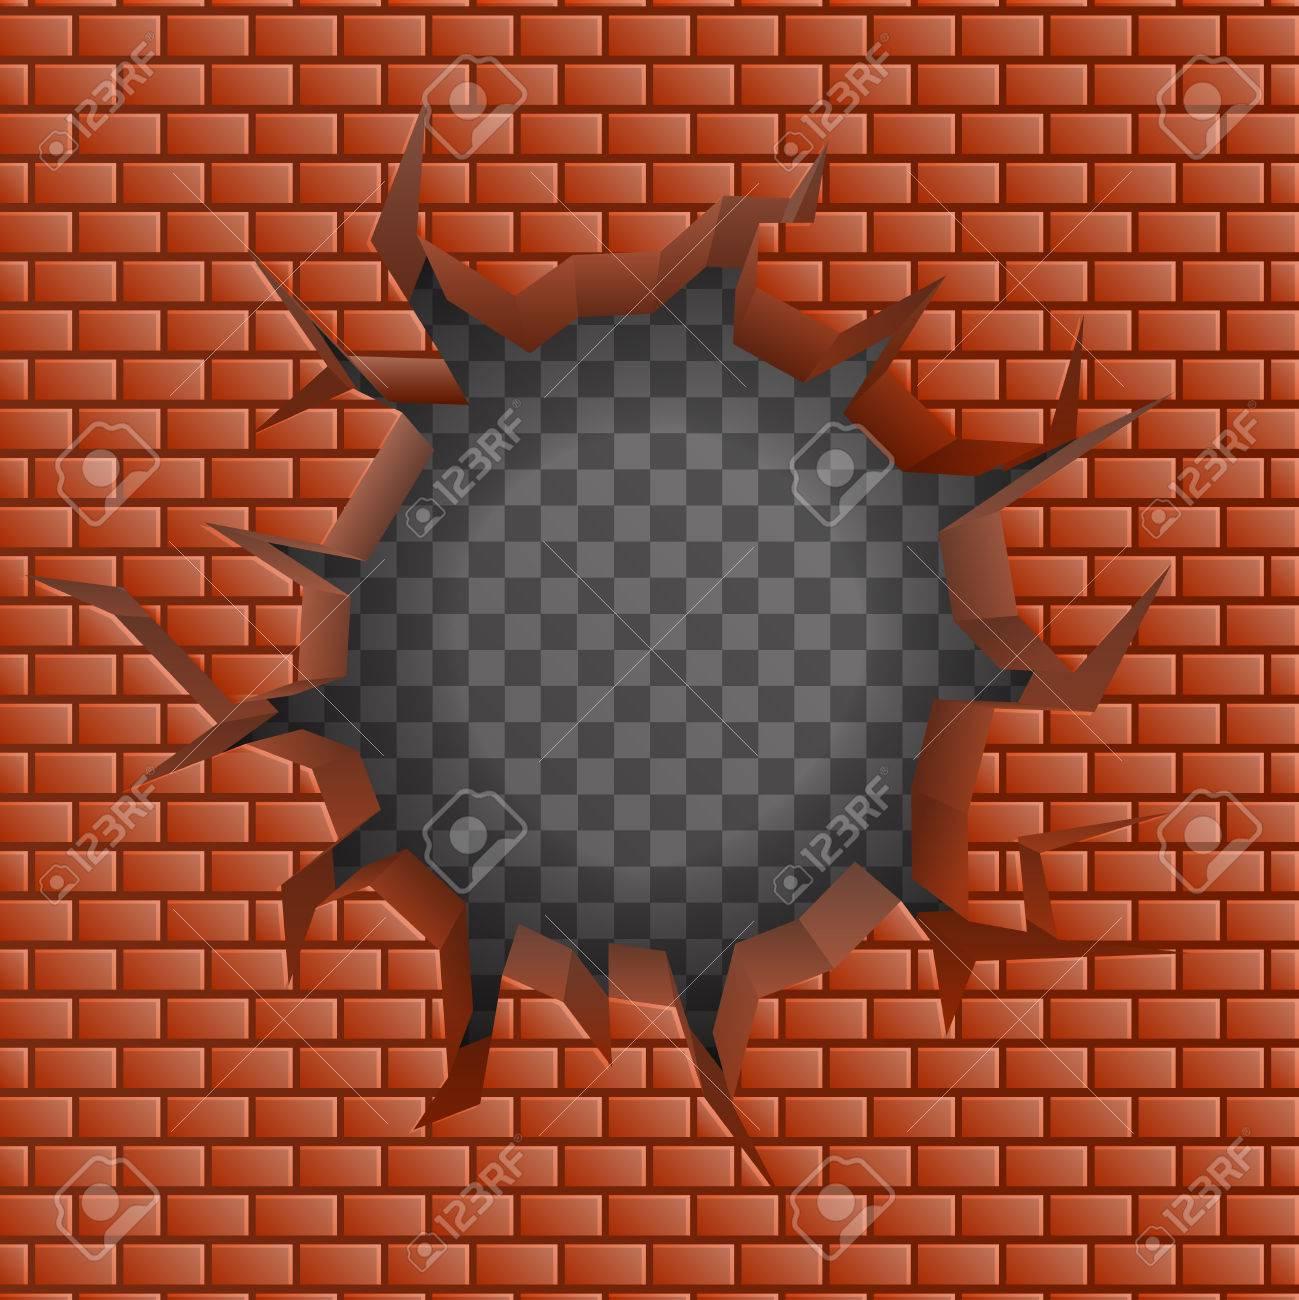 Brick Wall Hollow Crack Hole Transparent Background Vector Illustration